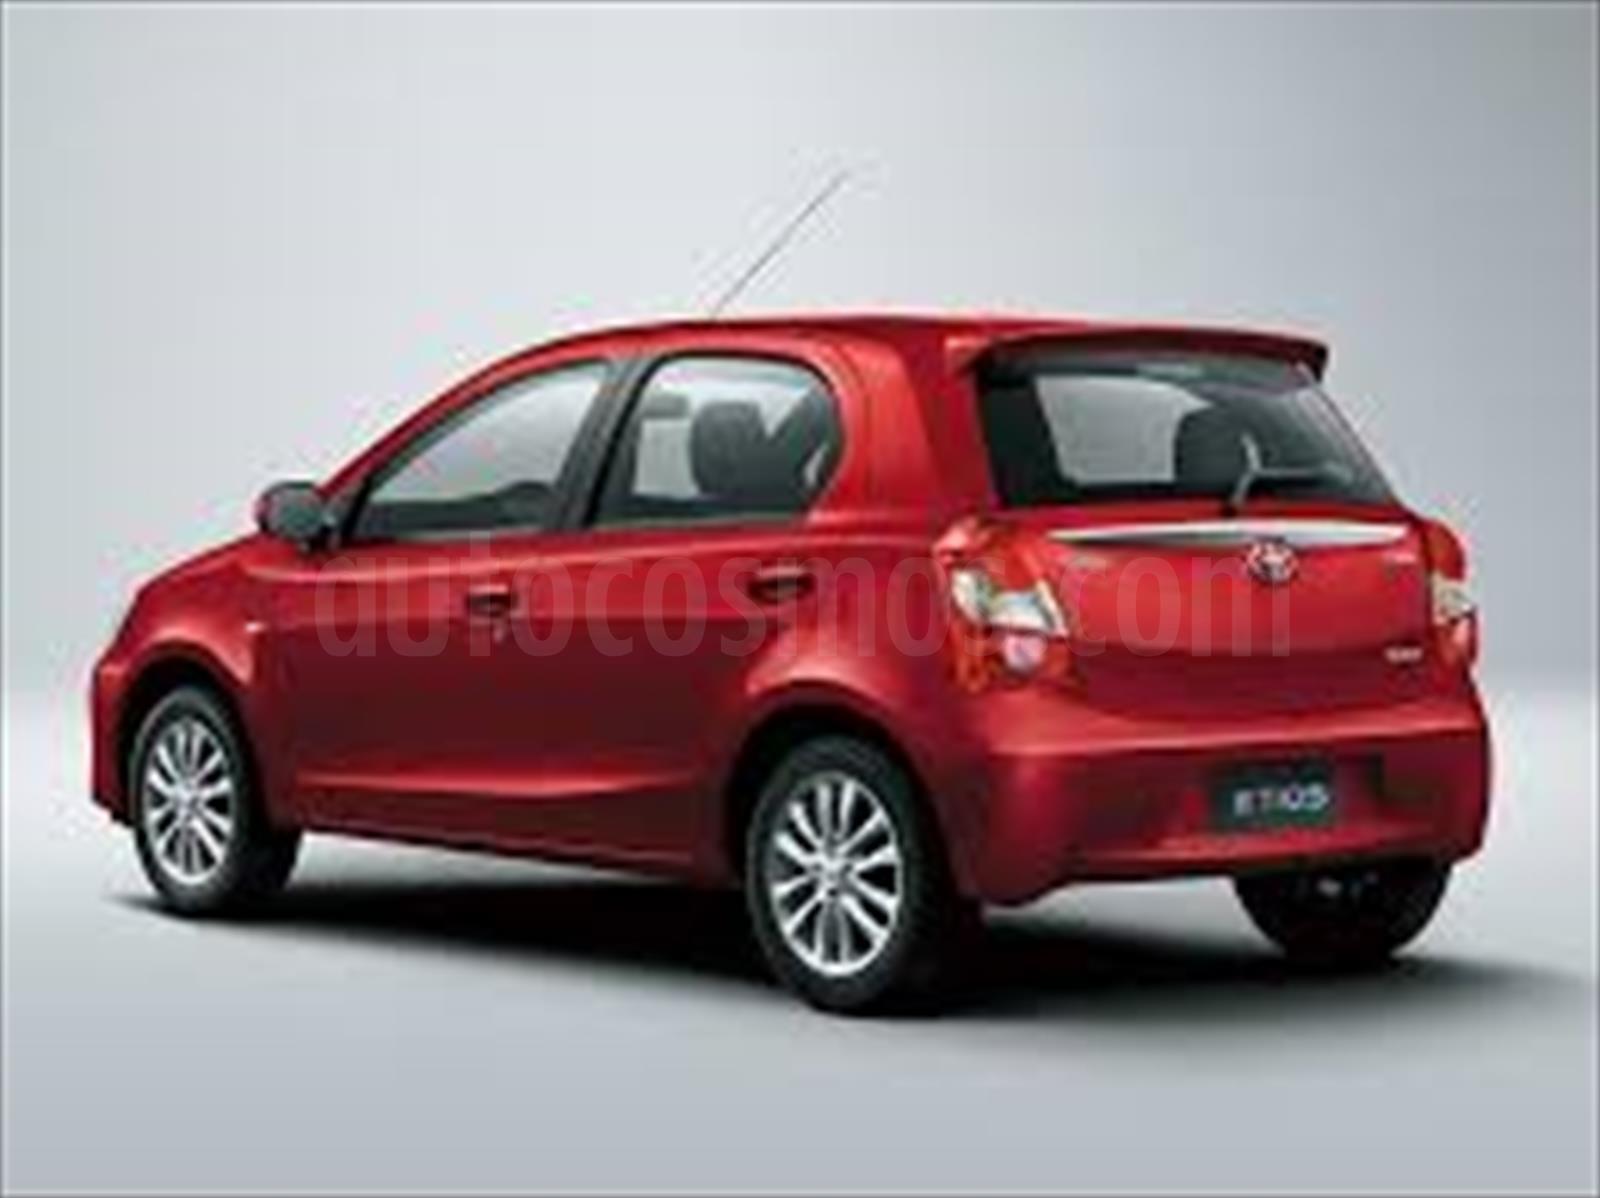 Venta autos usado - Tucuman - Toyota Etios Hatchback XLS